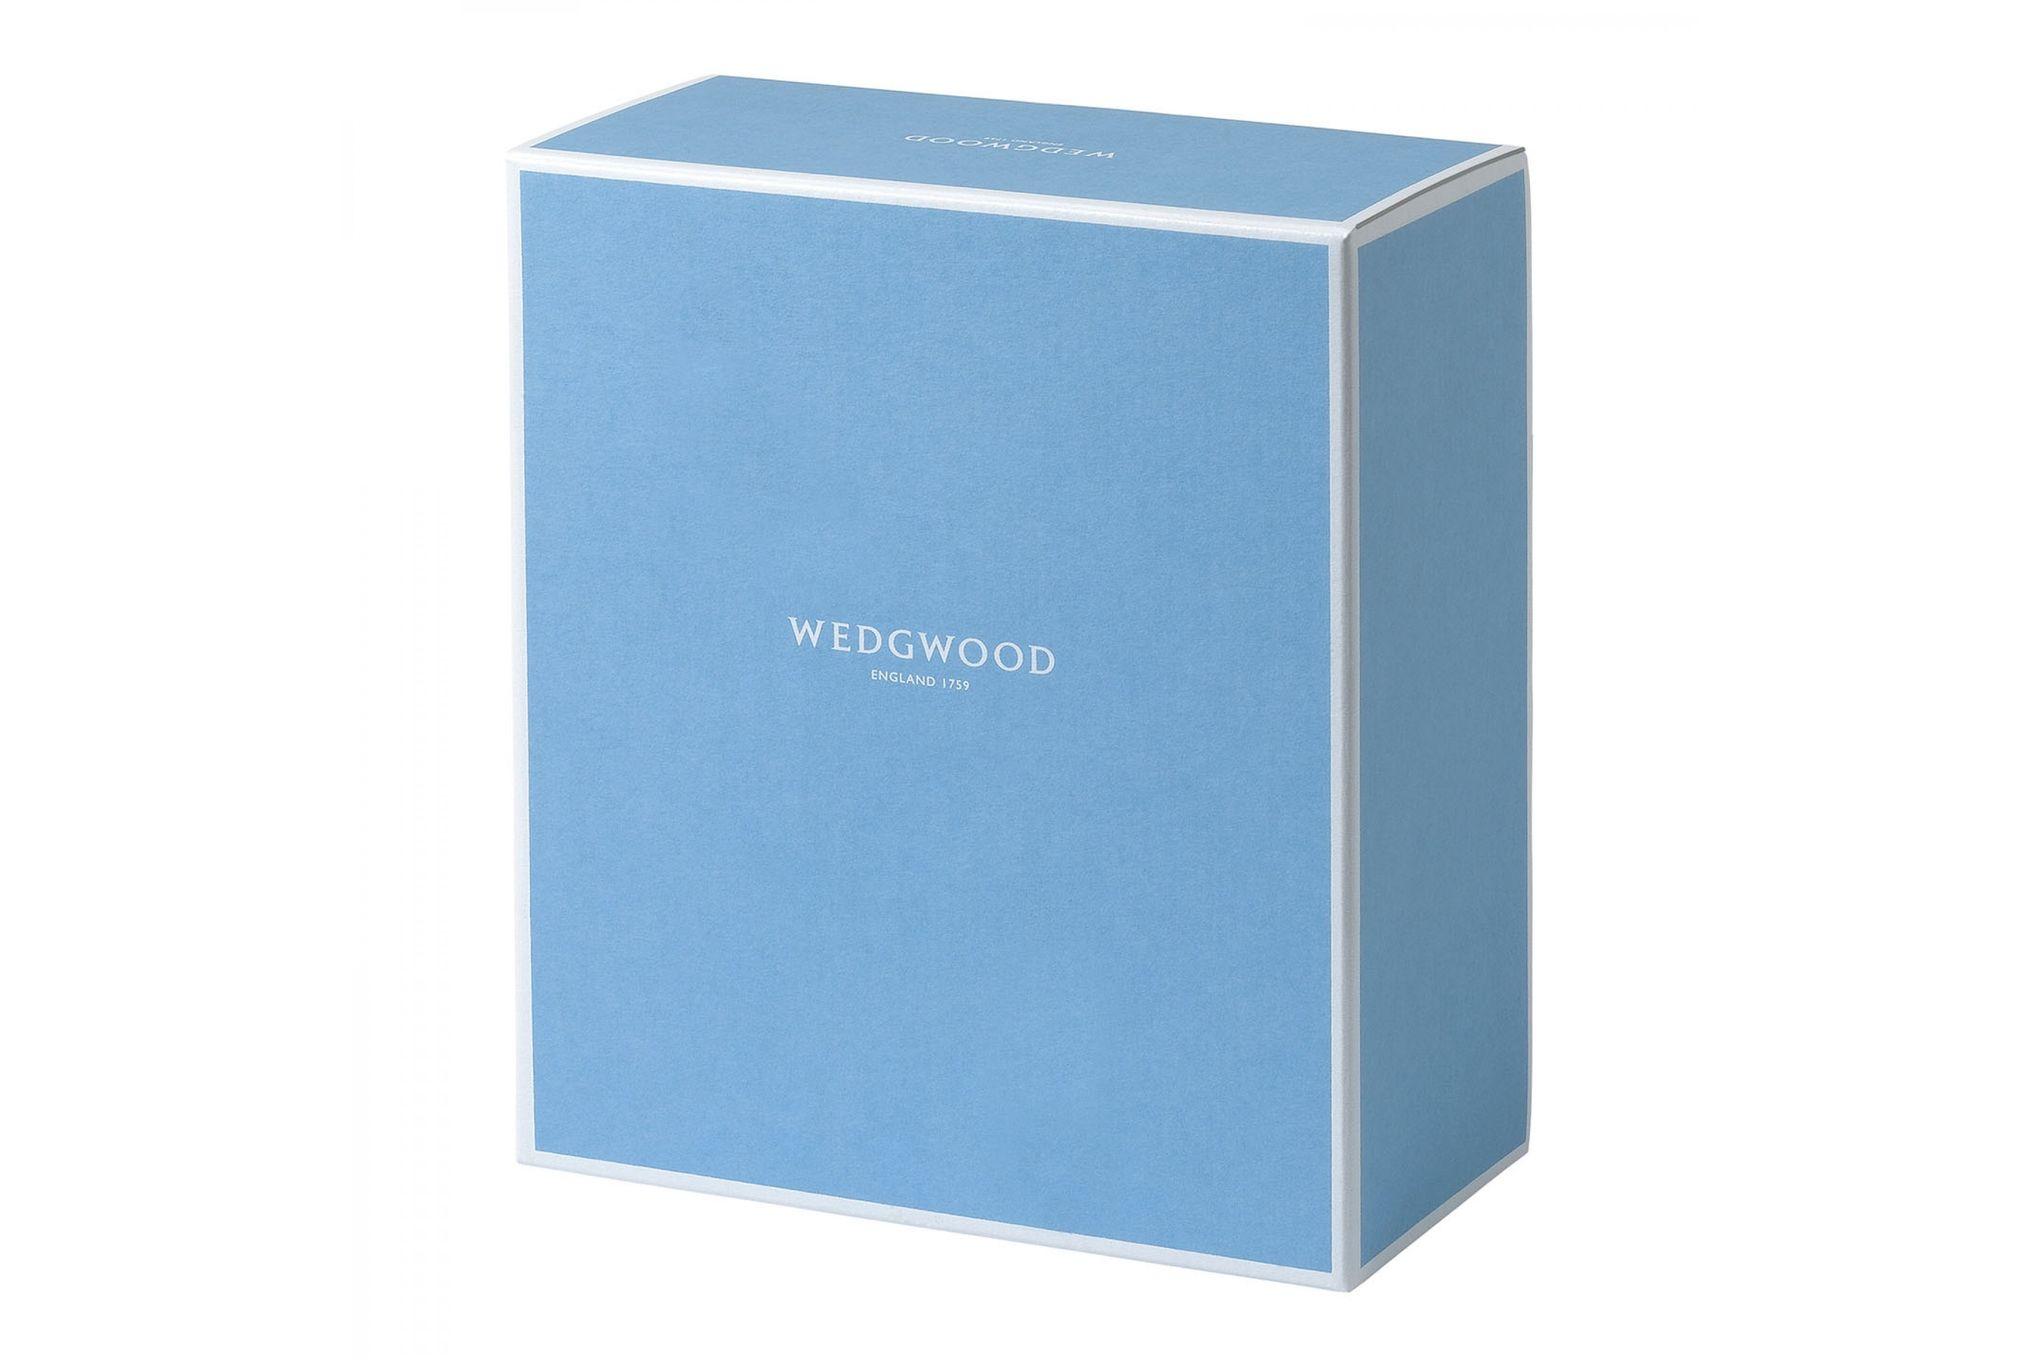 Wedgwood Globe Pair of Red Wine Glasses thumb 2